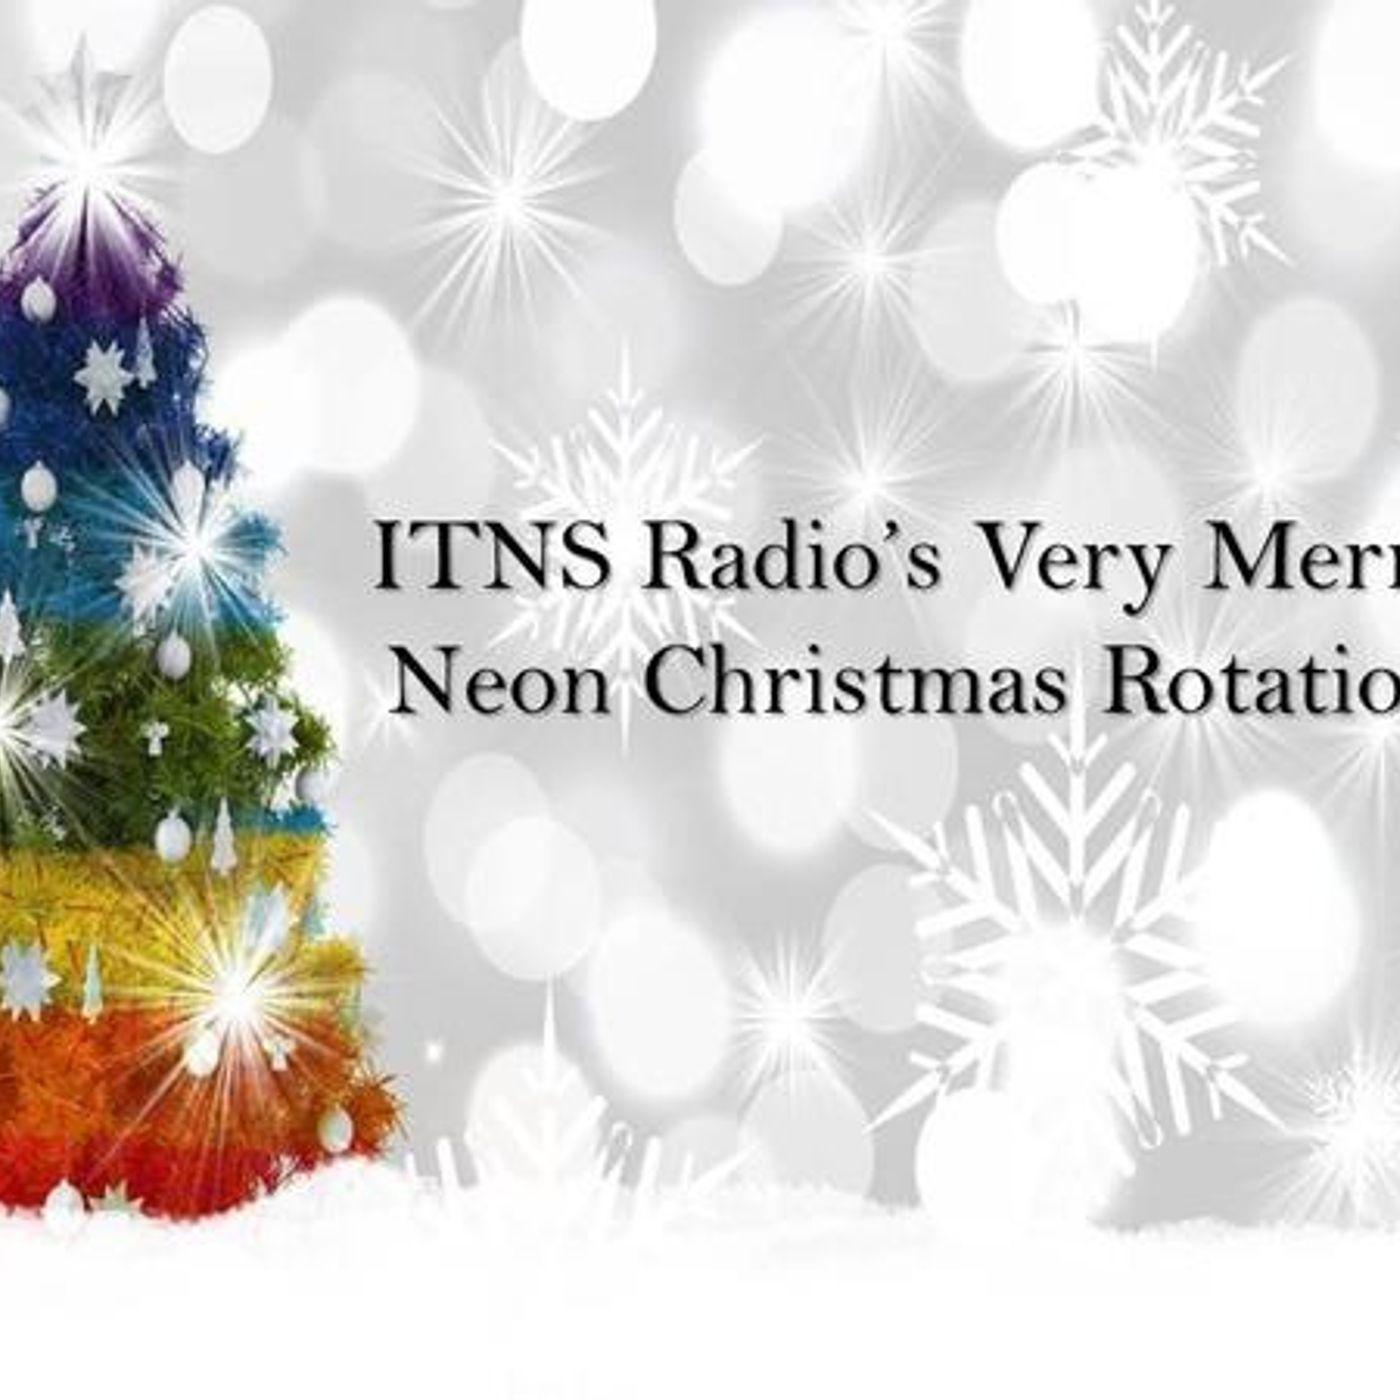 ITNS Radio's Very Merry Neon Christmas Rotation